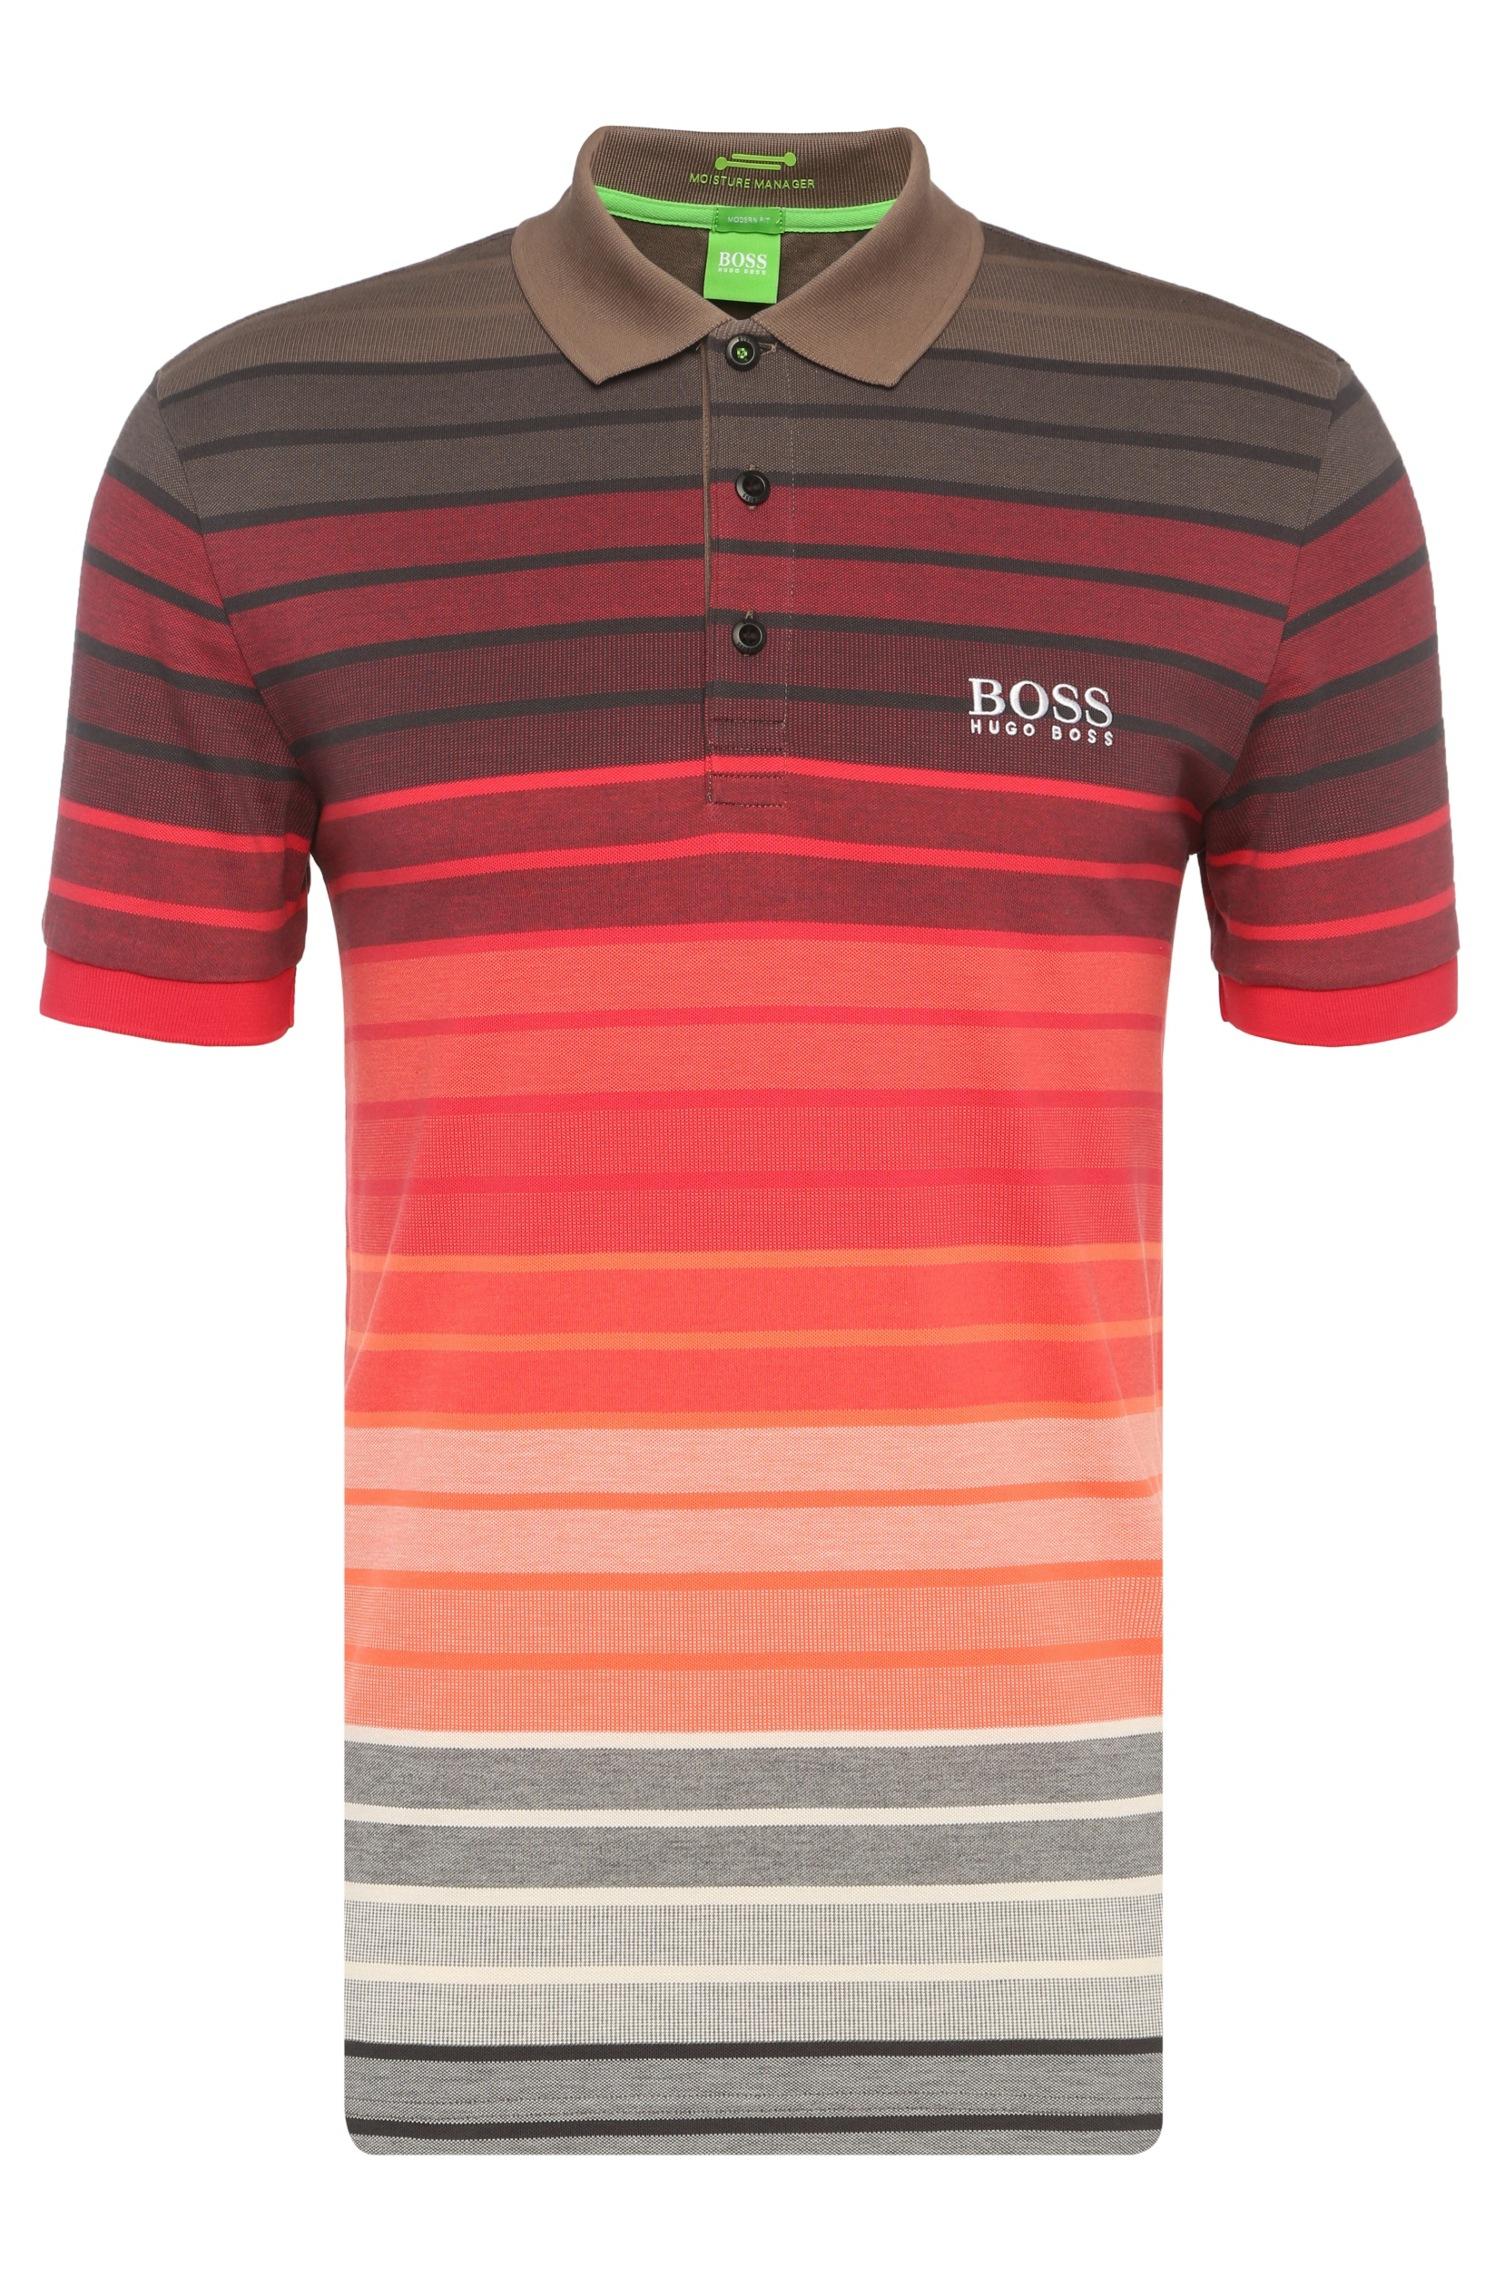 edc9c84b Hugo Boss Paddy Pro Polo Shirt | Top Mode Depot